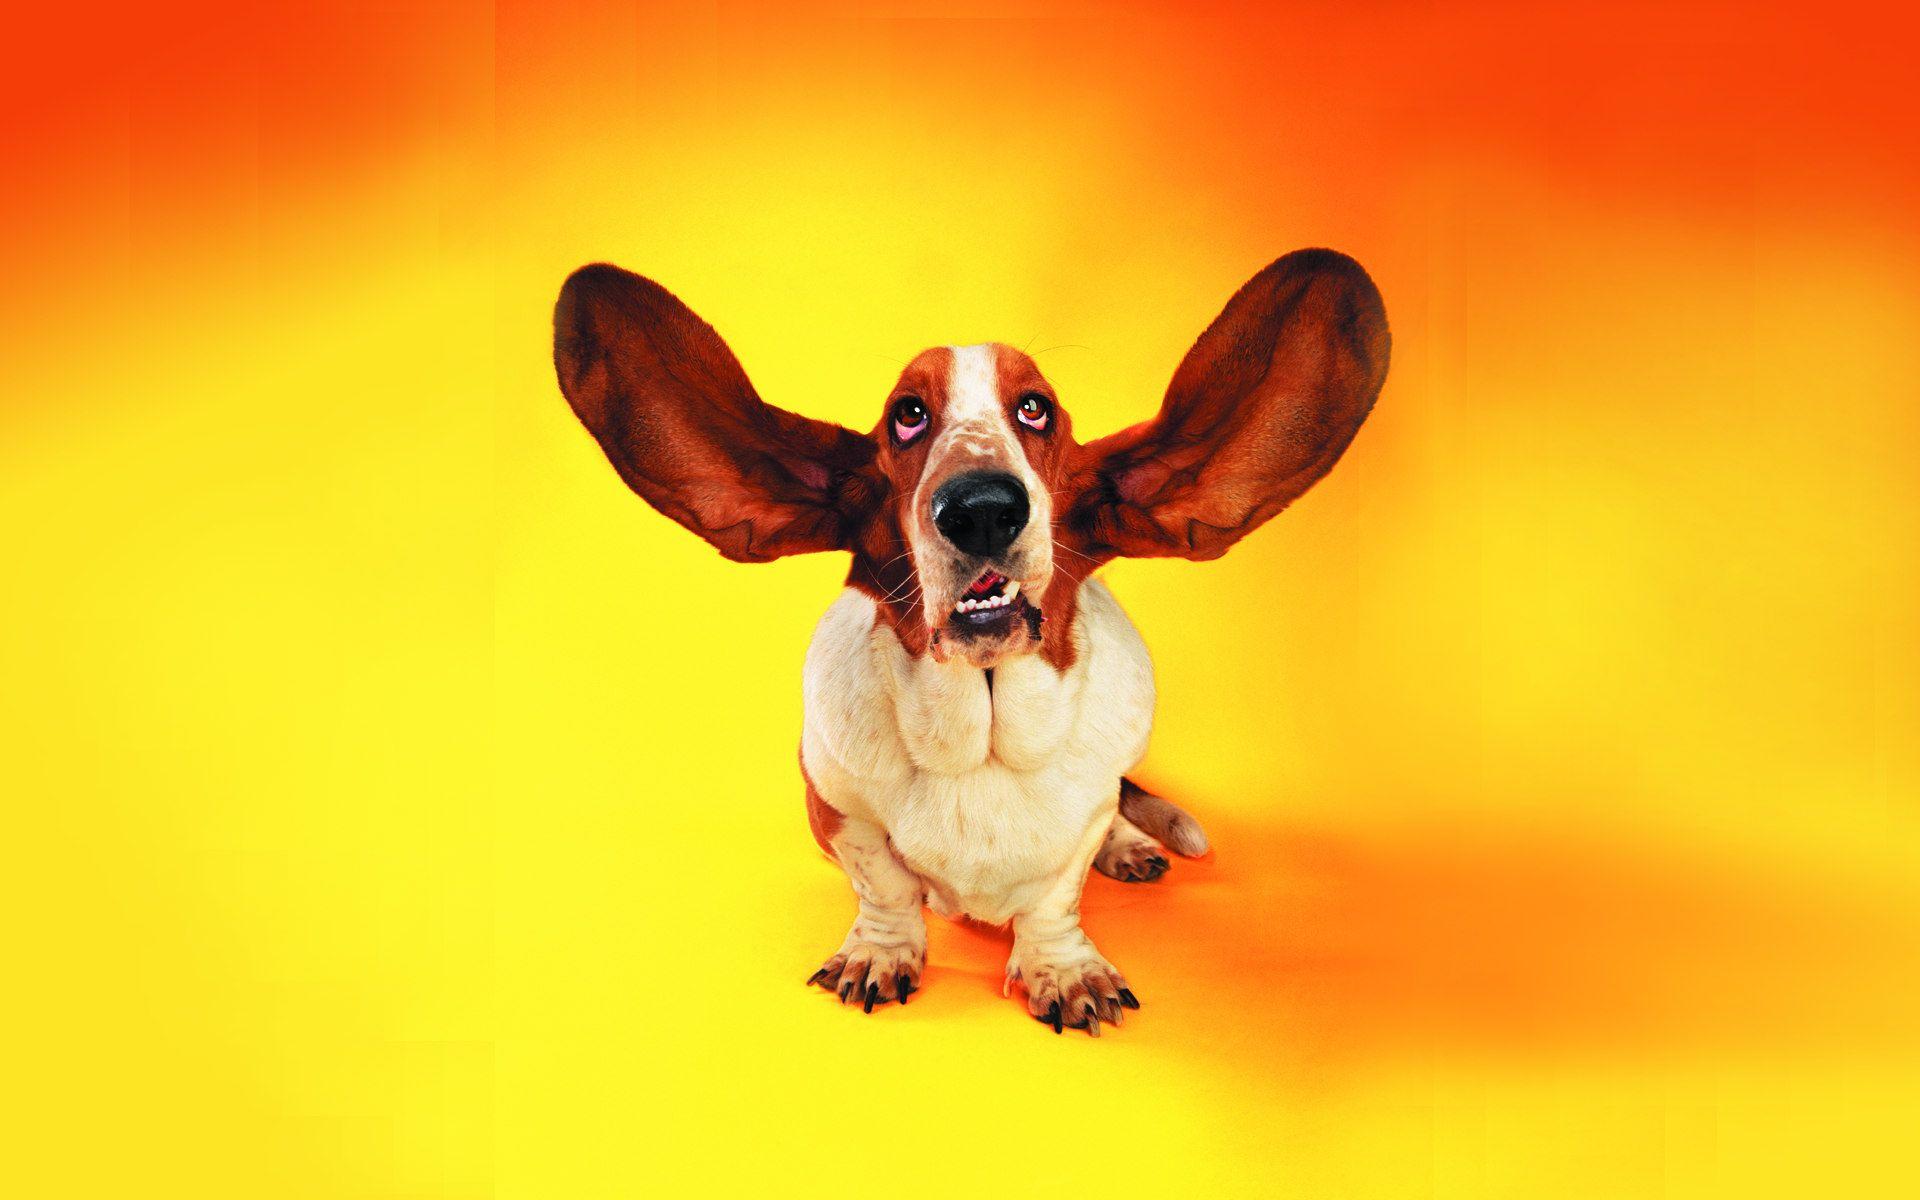 Free download funny dog wallpaper animais pinterest dog animal free download funny dog wallpaper sciox Gallery